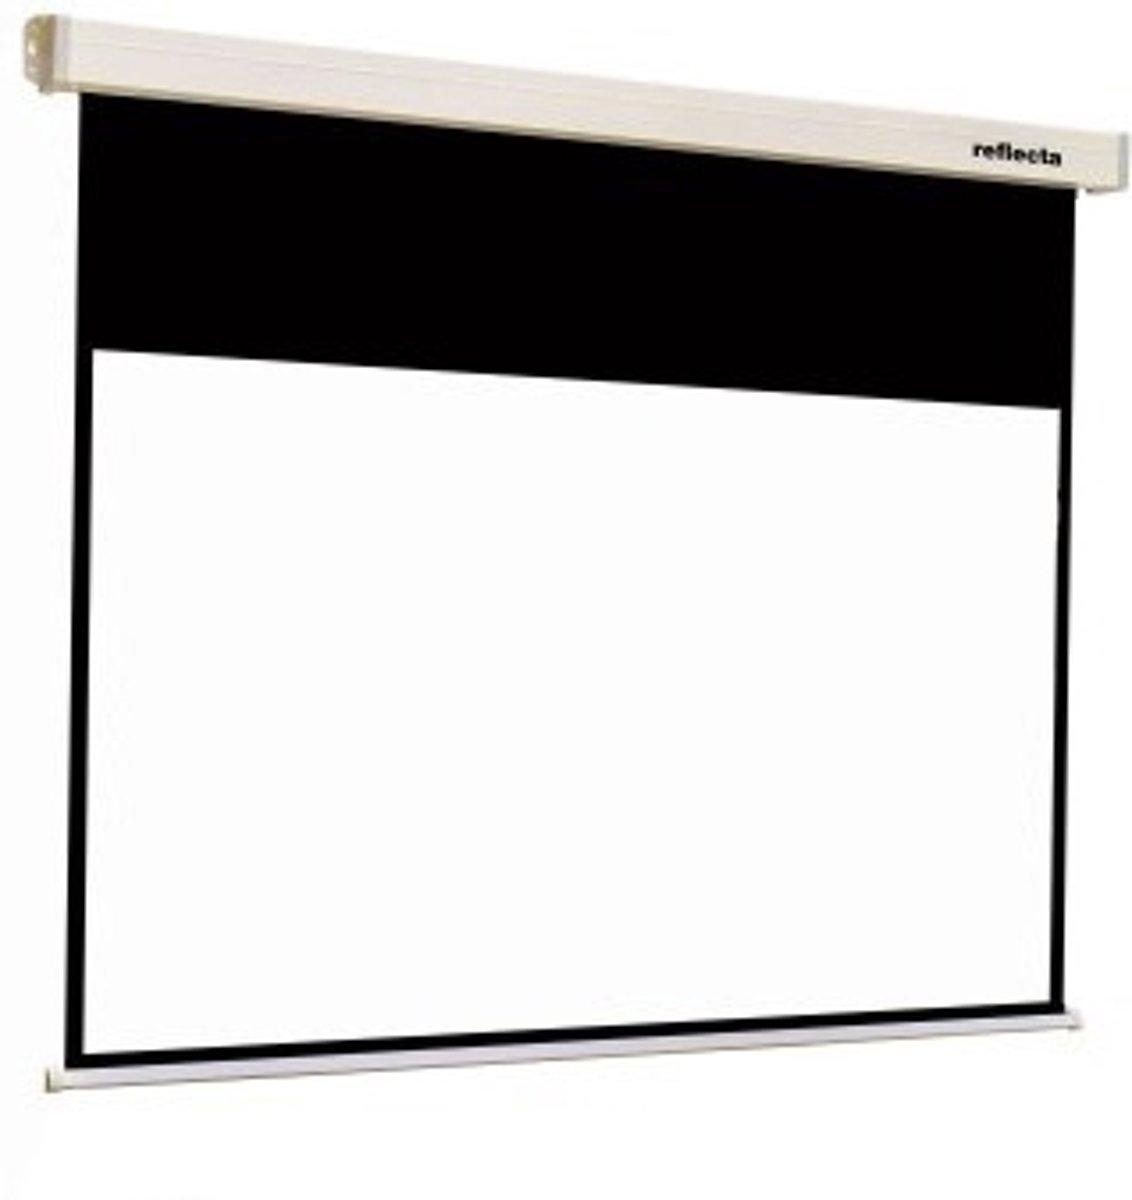 Reflecta Screen Crystal-L.200X152 Cm kopen